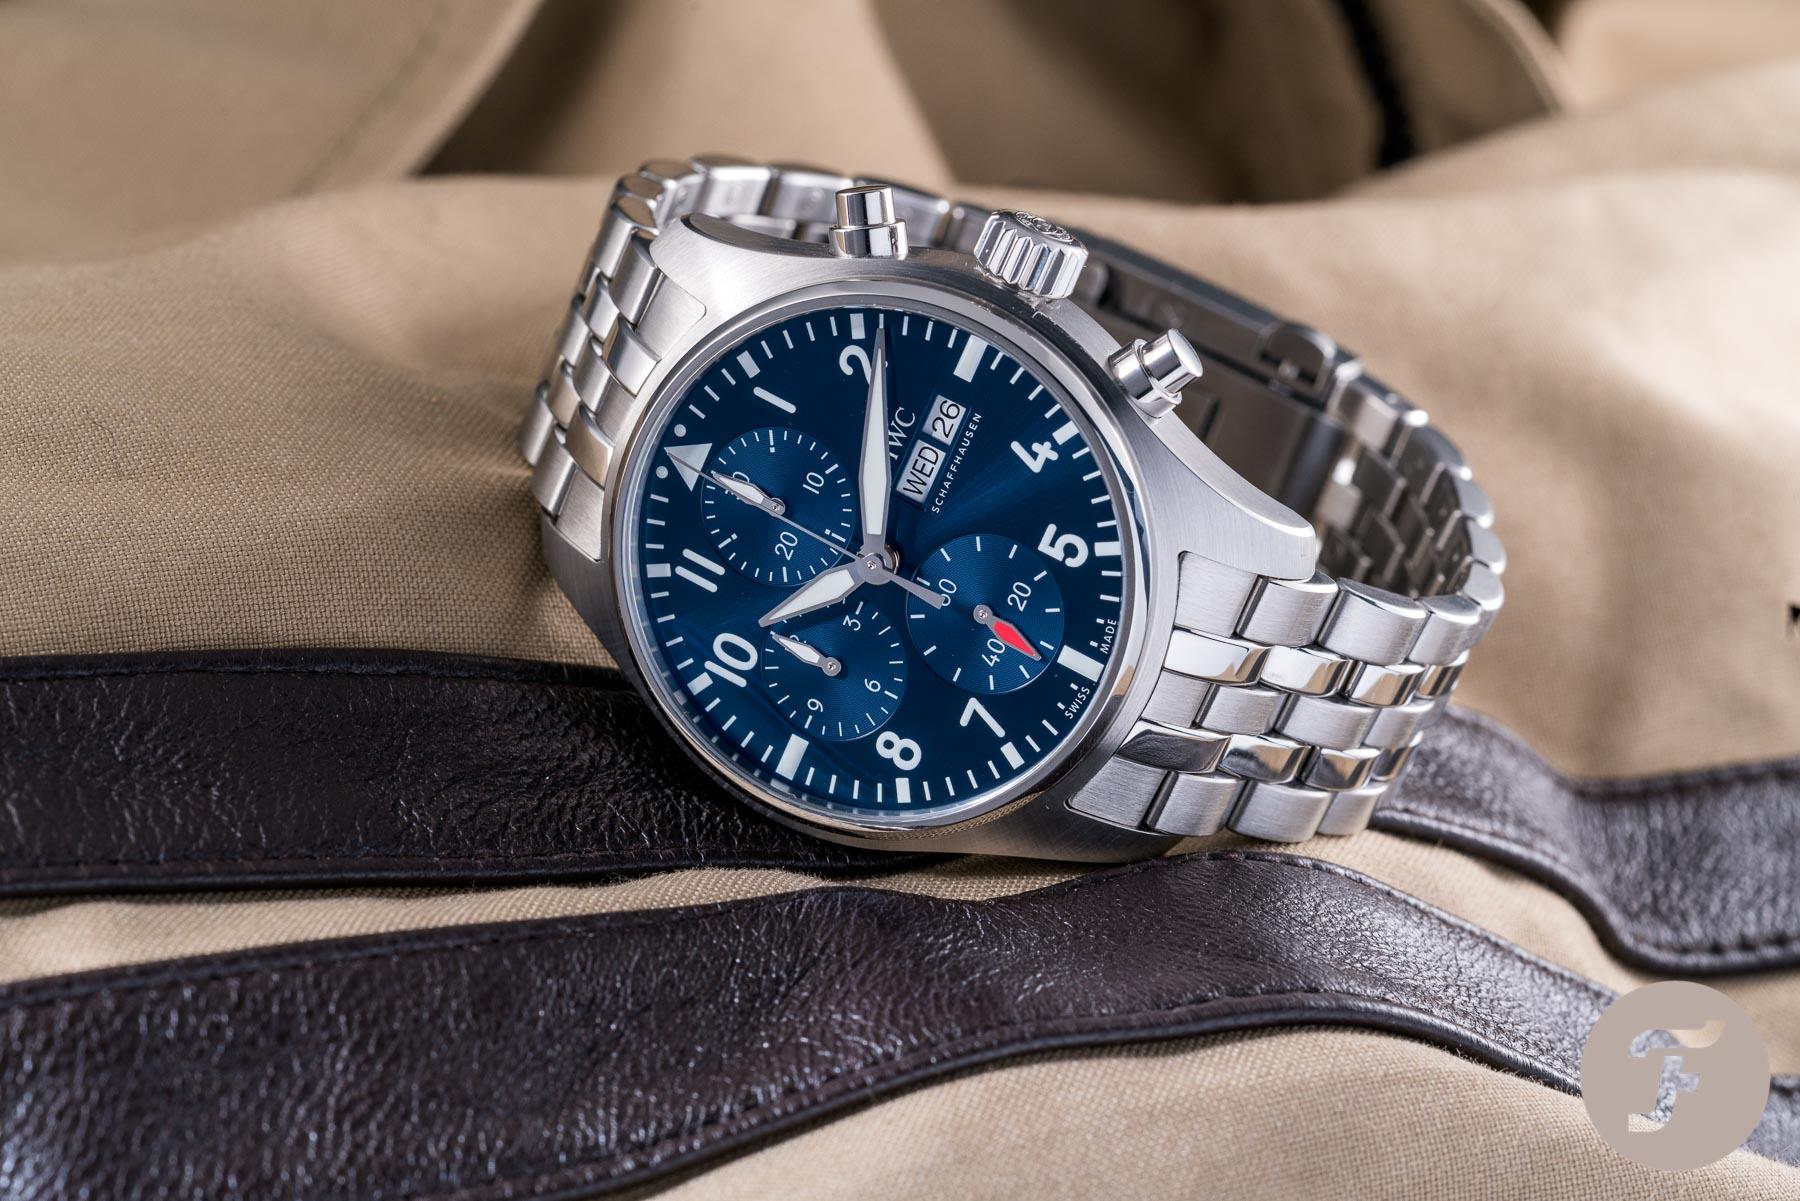 Sunday Morning Showdown: Pilot's Paragon — IWC Vs. Breitling